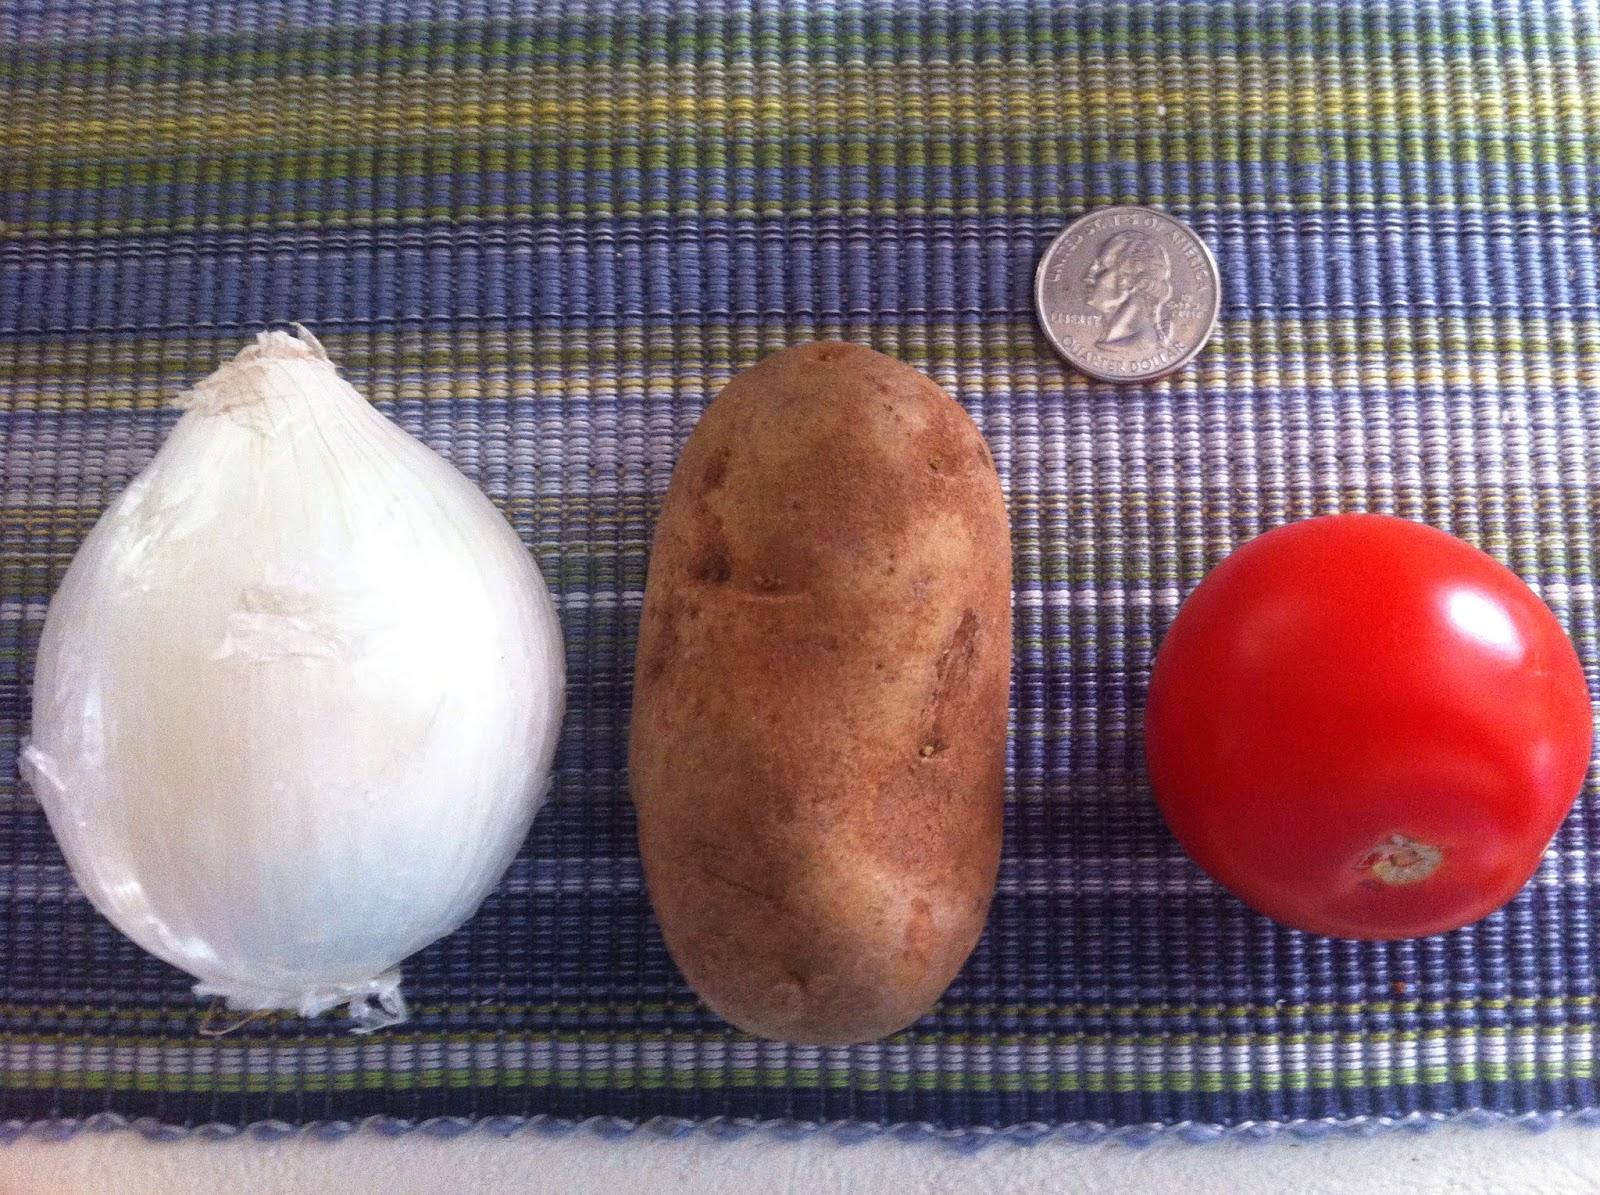 Small onion, potato, and tomato next to a quarter for scale